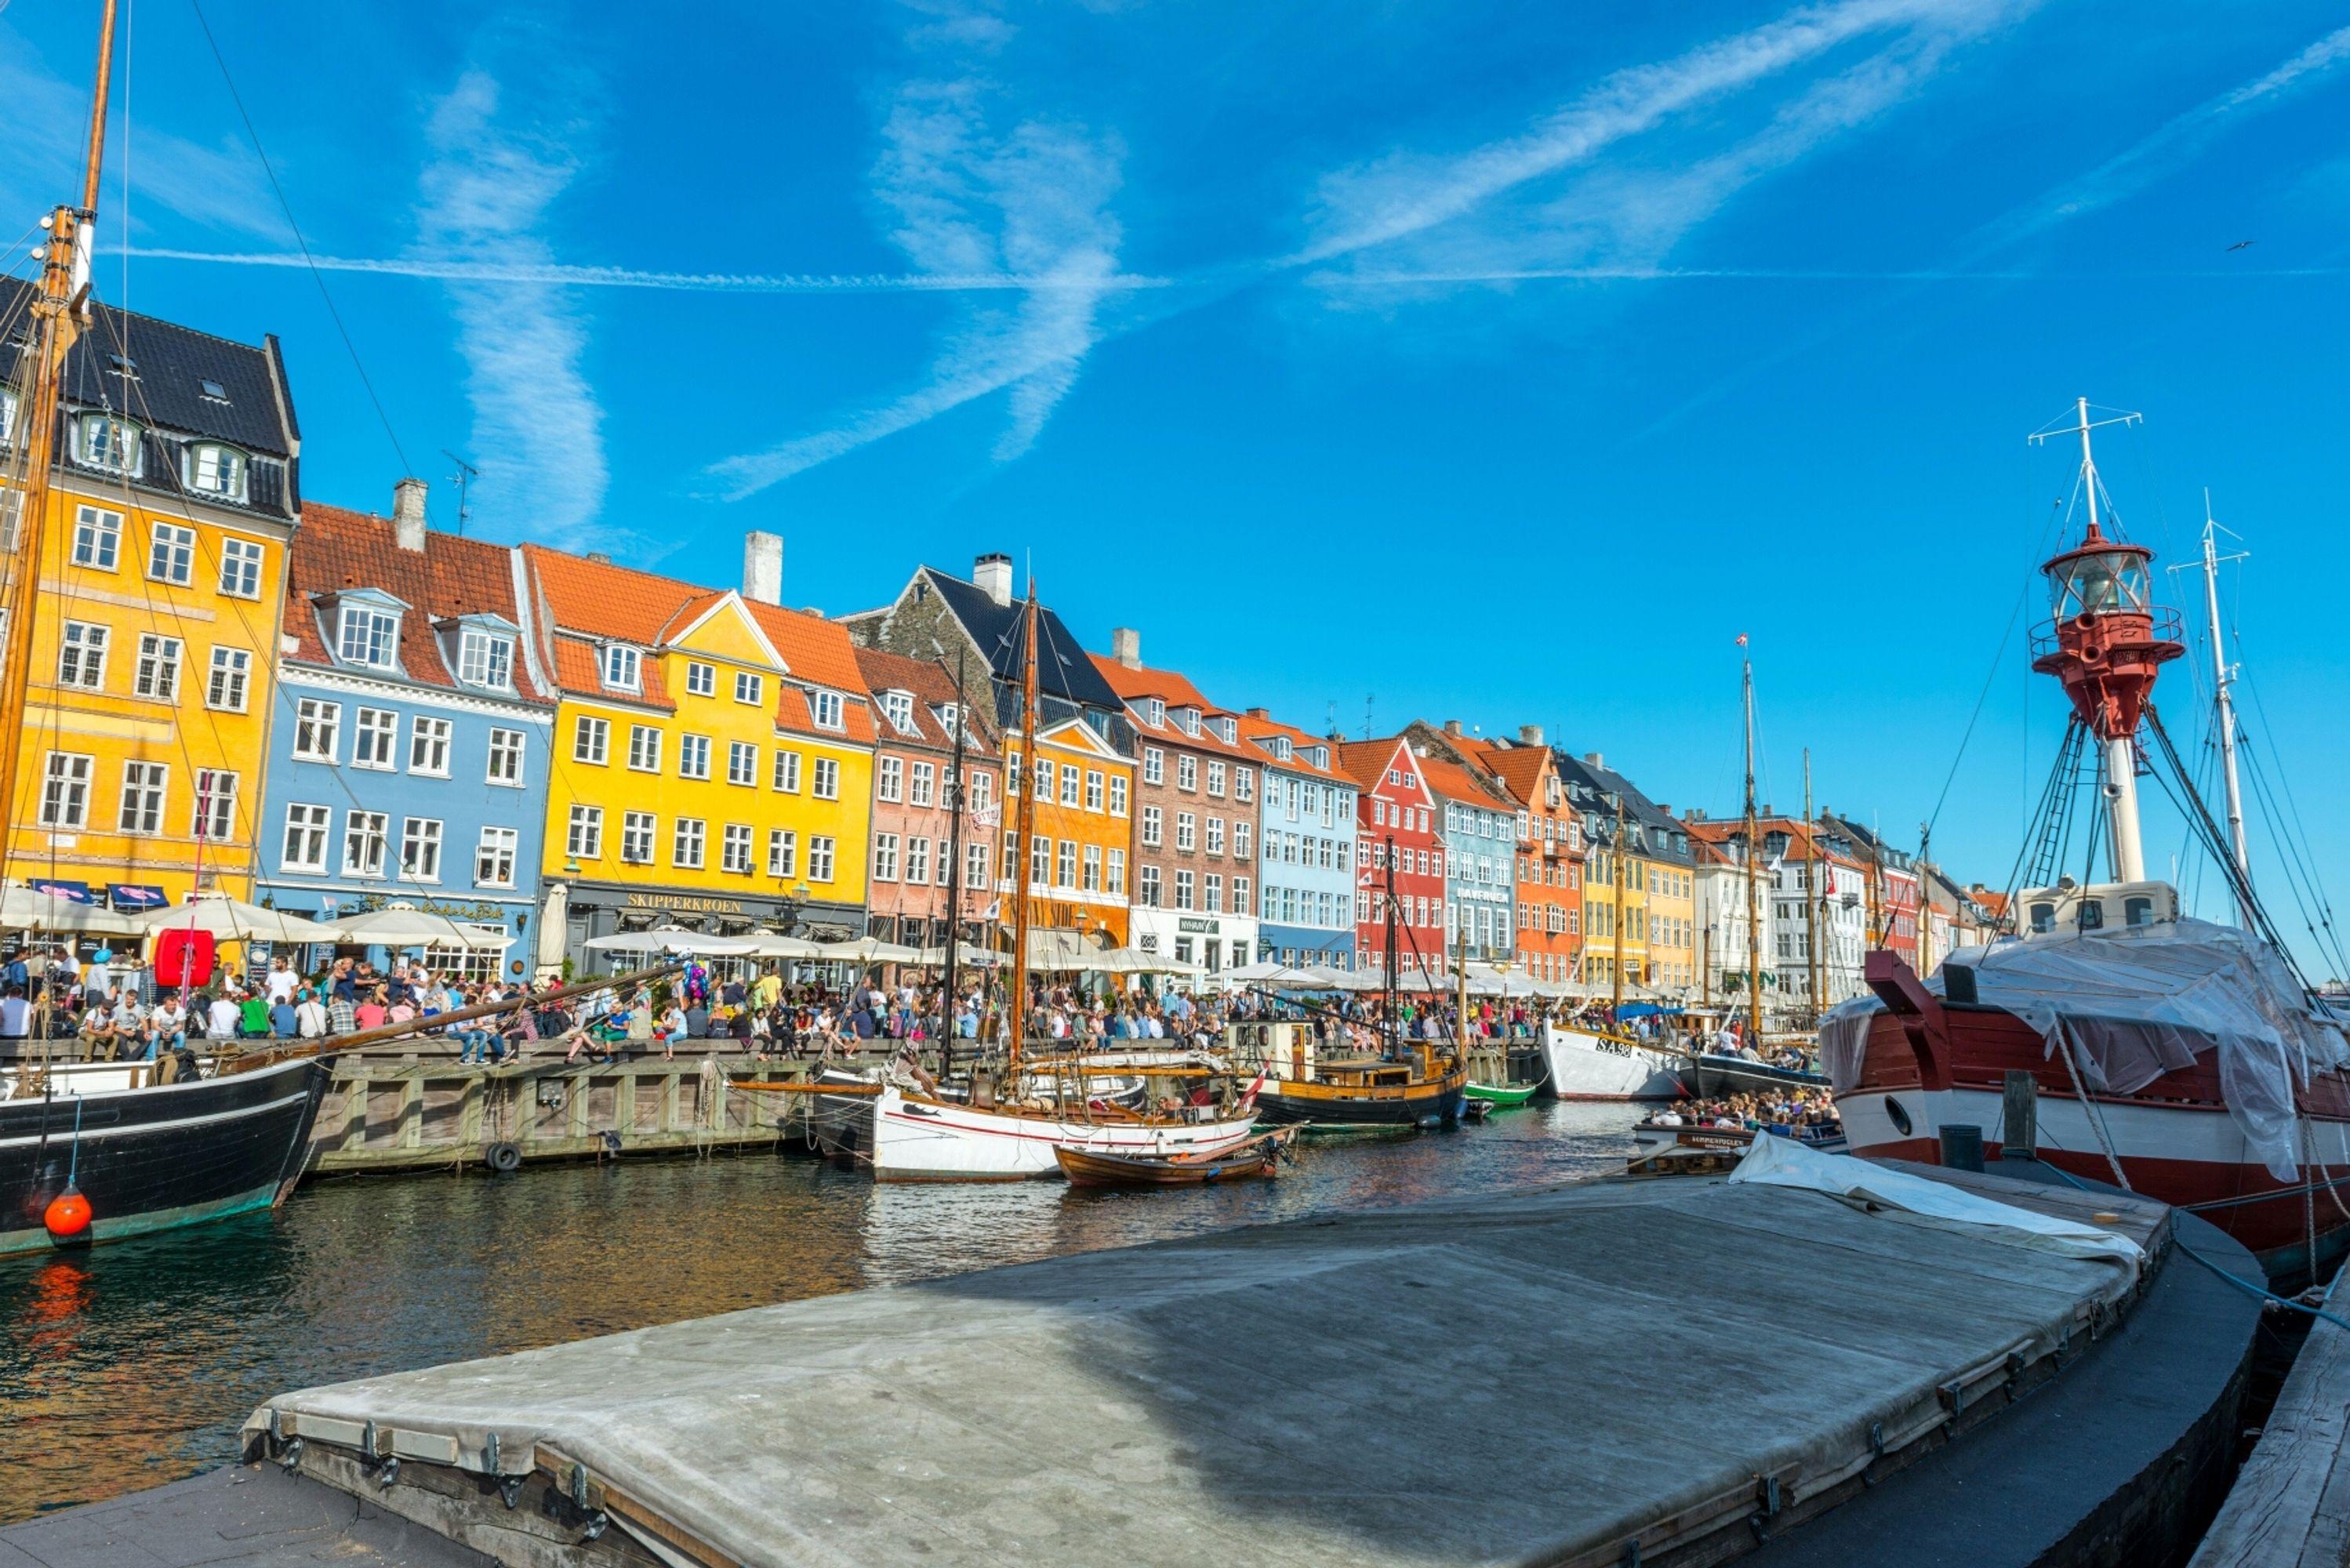 To λιμάνι του Μάλμε - εναλλακτικά ταξίδια στην Ευρώπη